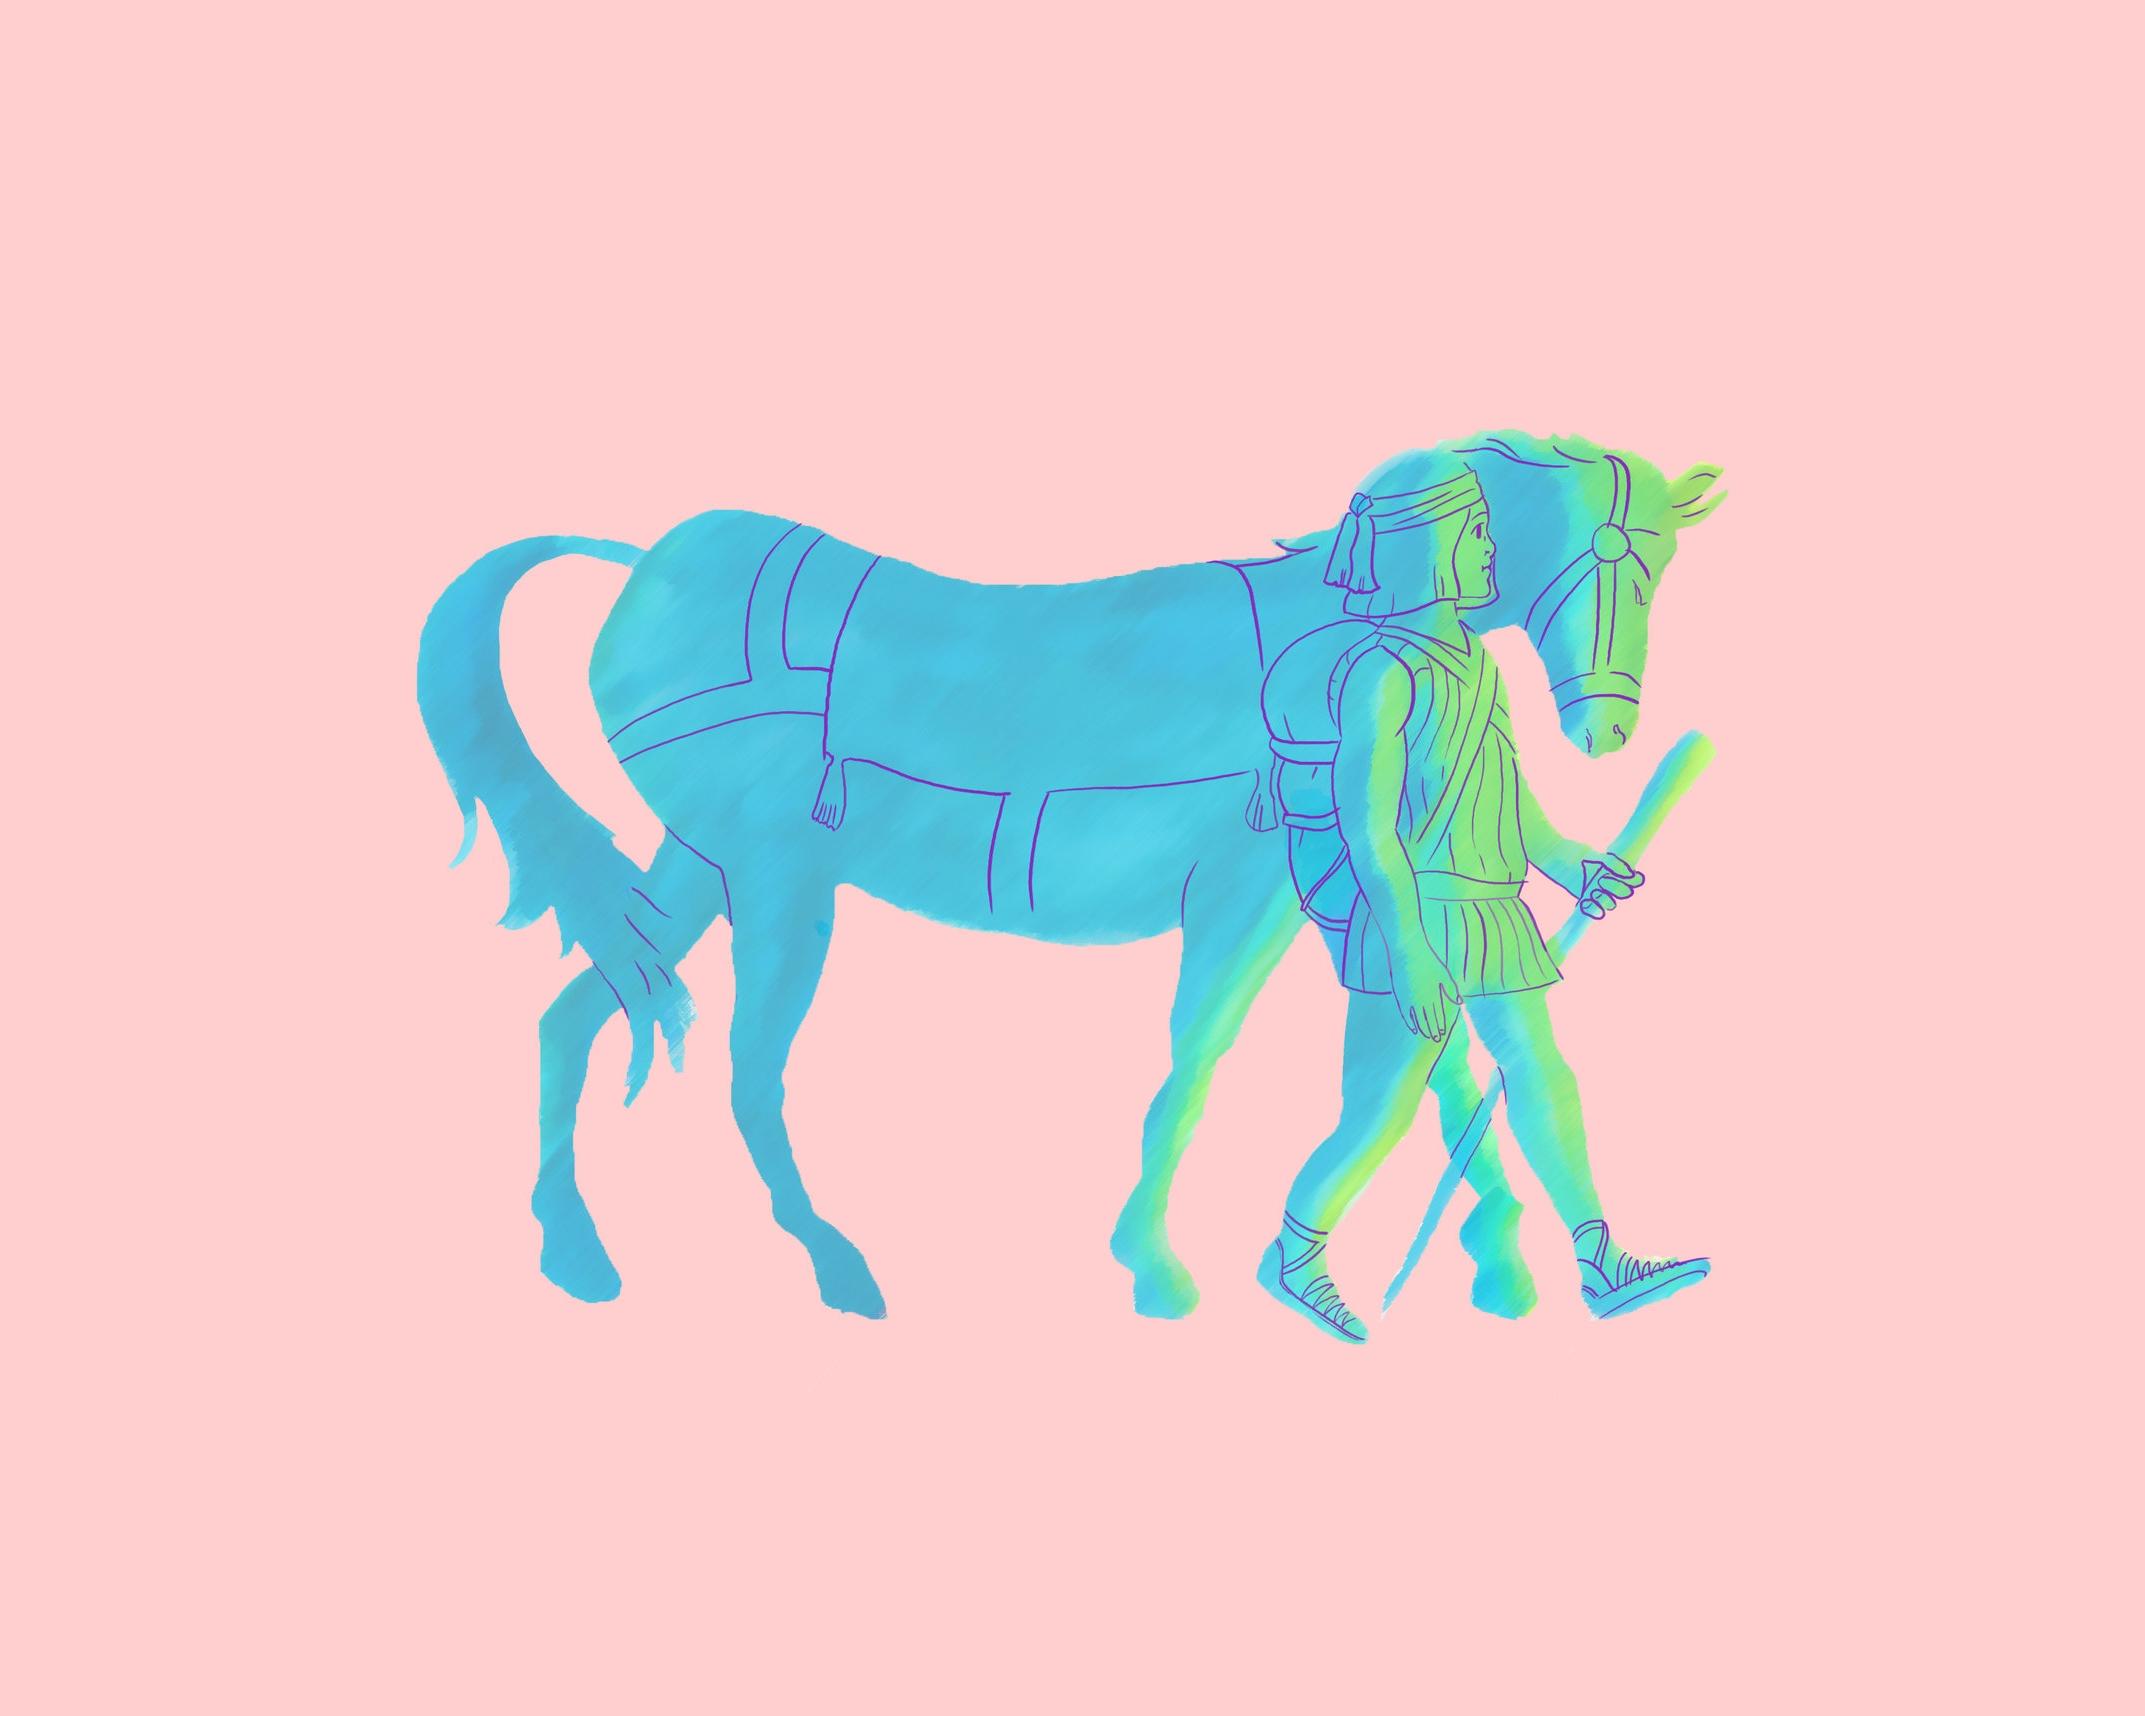 Horse Walker - Personal Work, 2018